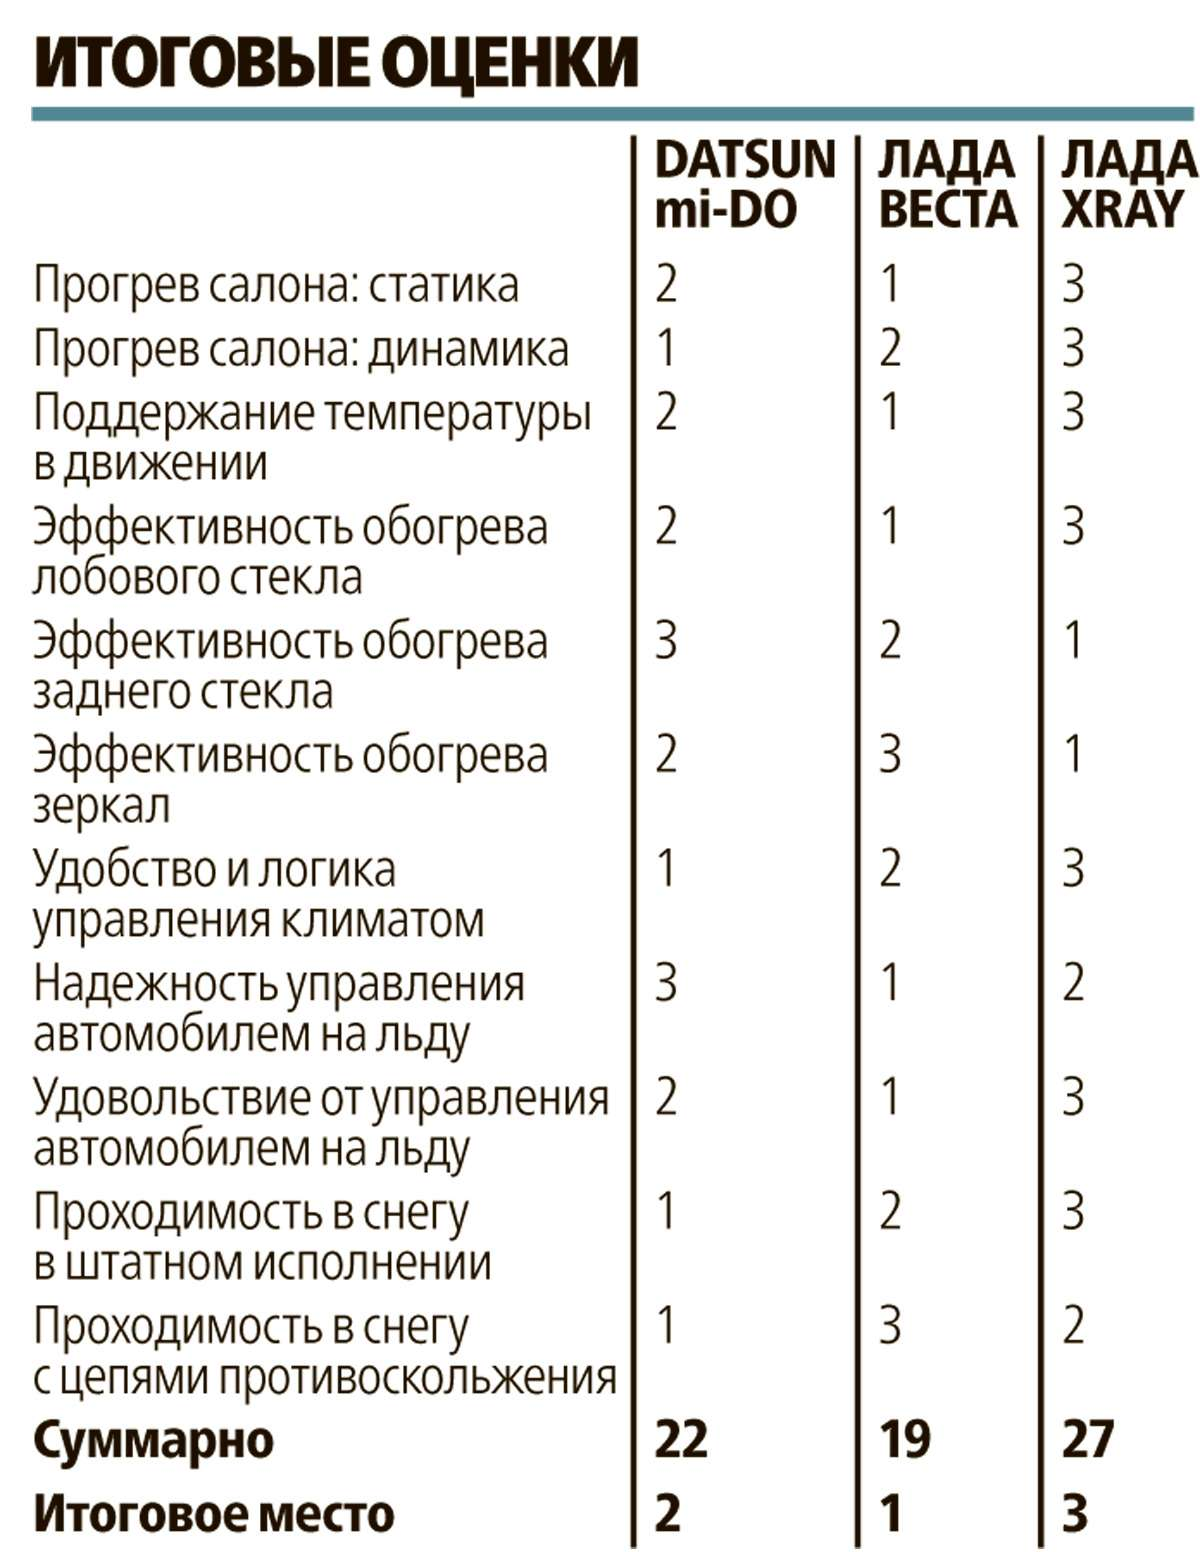 Большой зимний тест: Lada Vesta, Lada XRAY иDatsun mi-DO изпарка ЗР— фото 571546